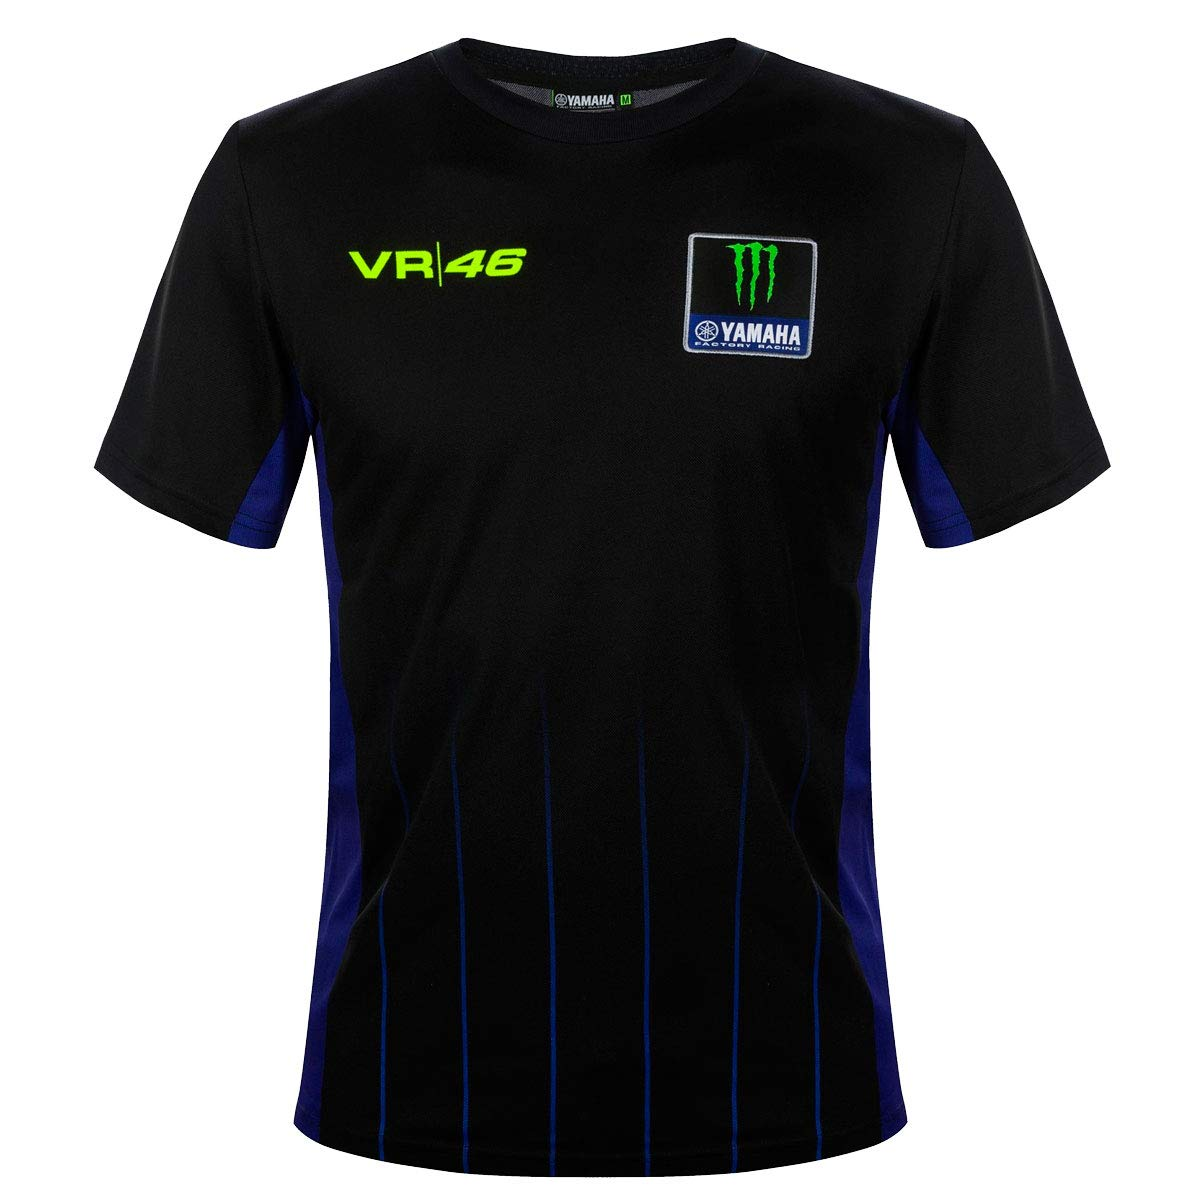 Master Lap Camiseta Valentino Rossi Yamaha Negra